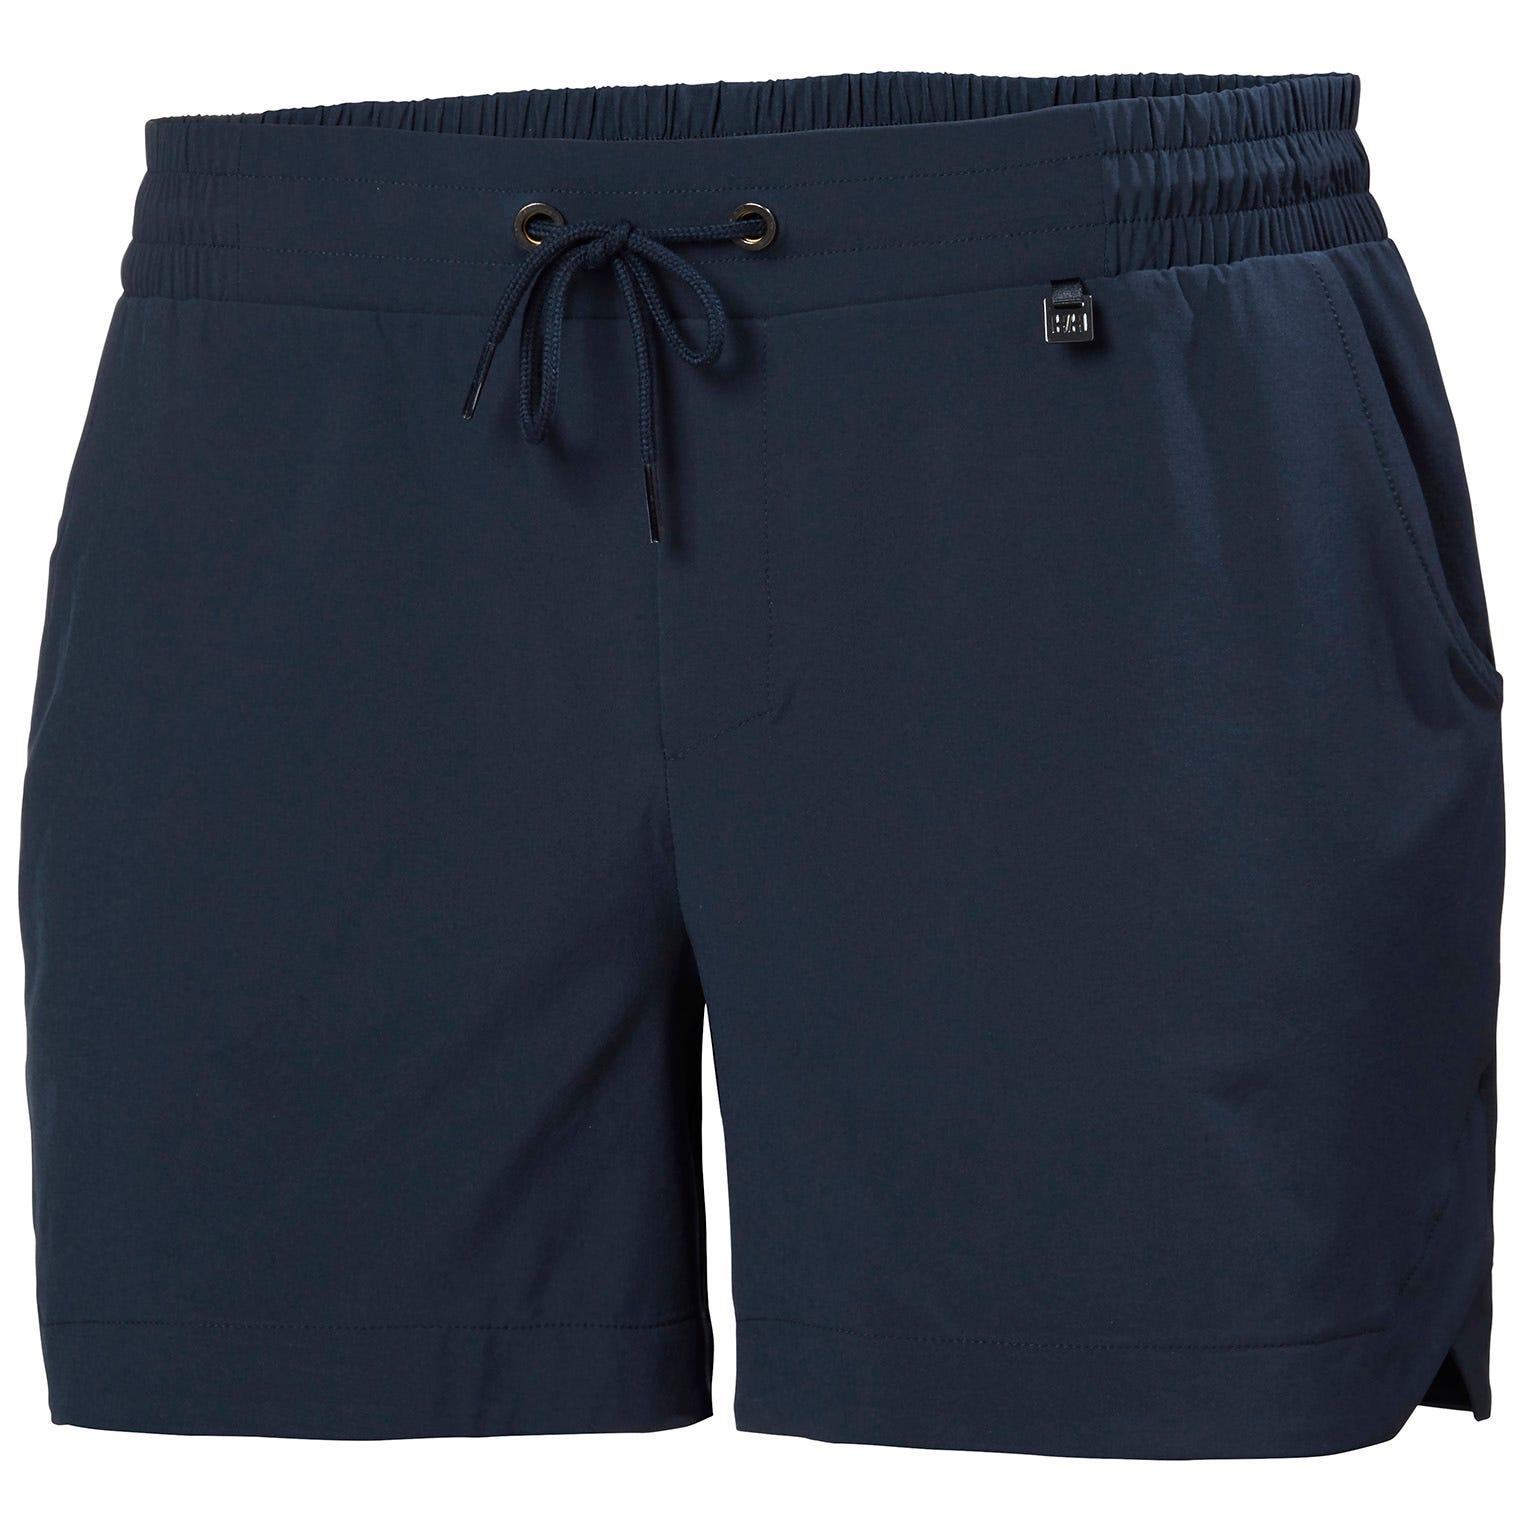 Helly Hansen Womens Thalia 2 Shorts Sailing Trouser Navy XL